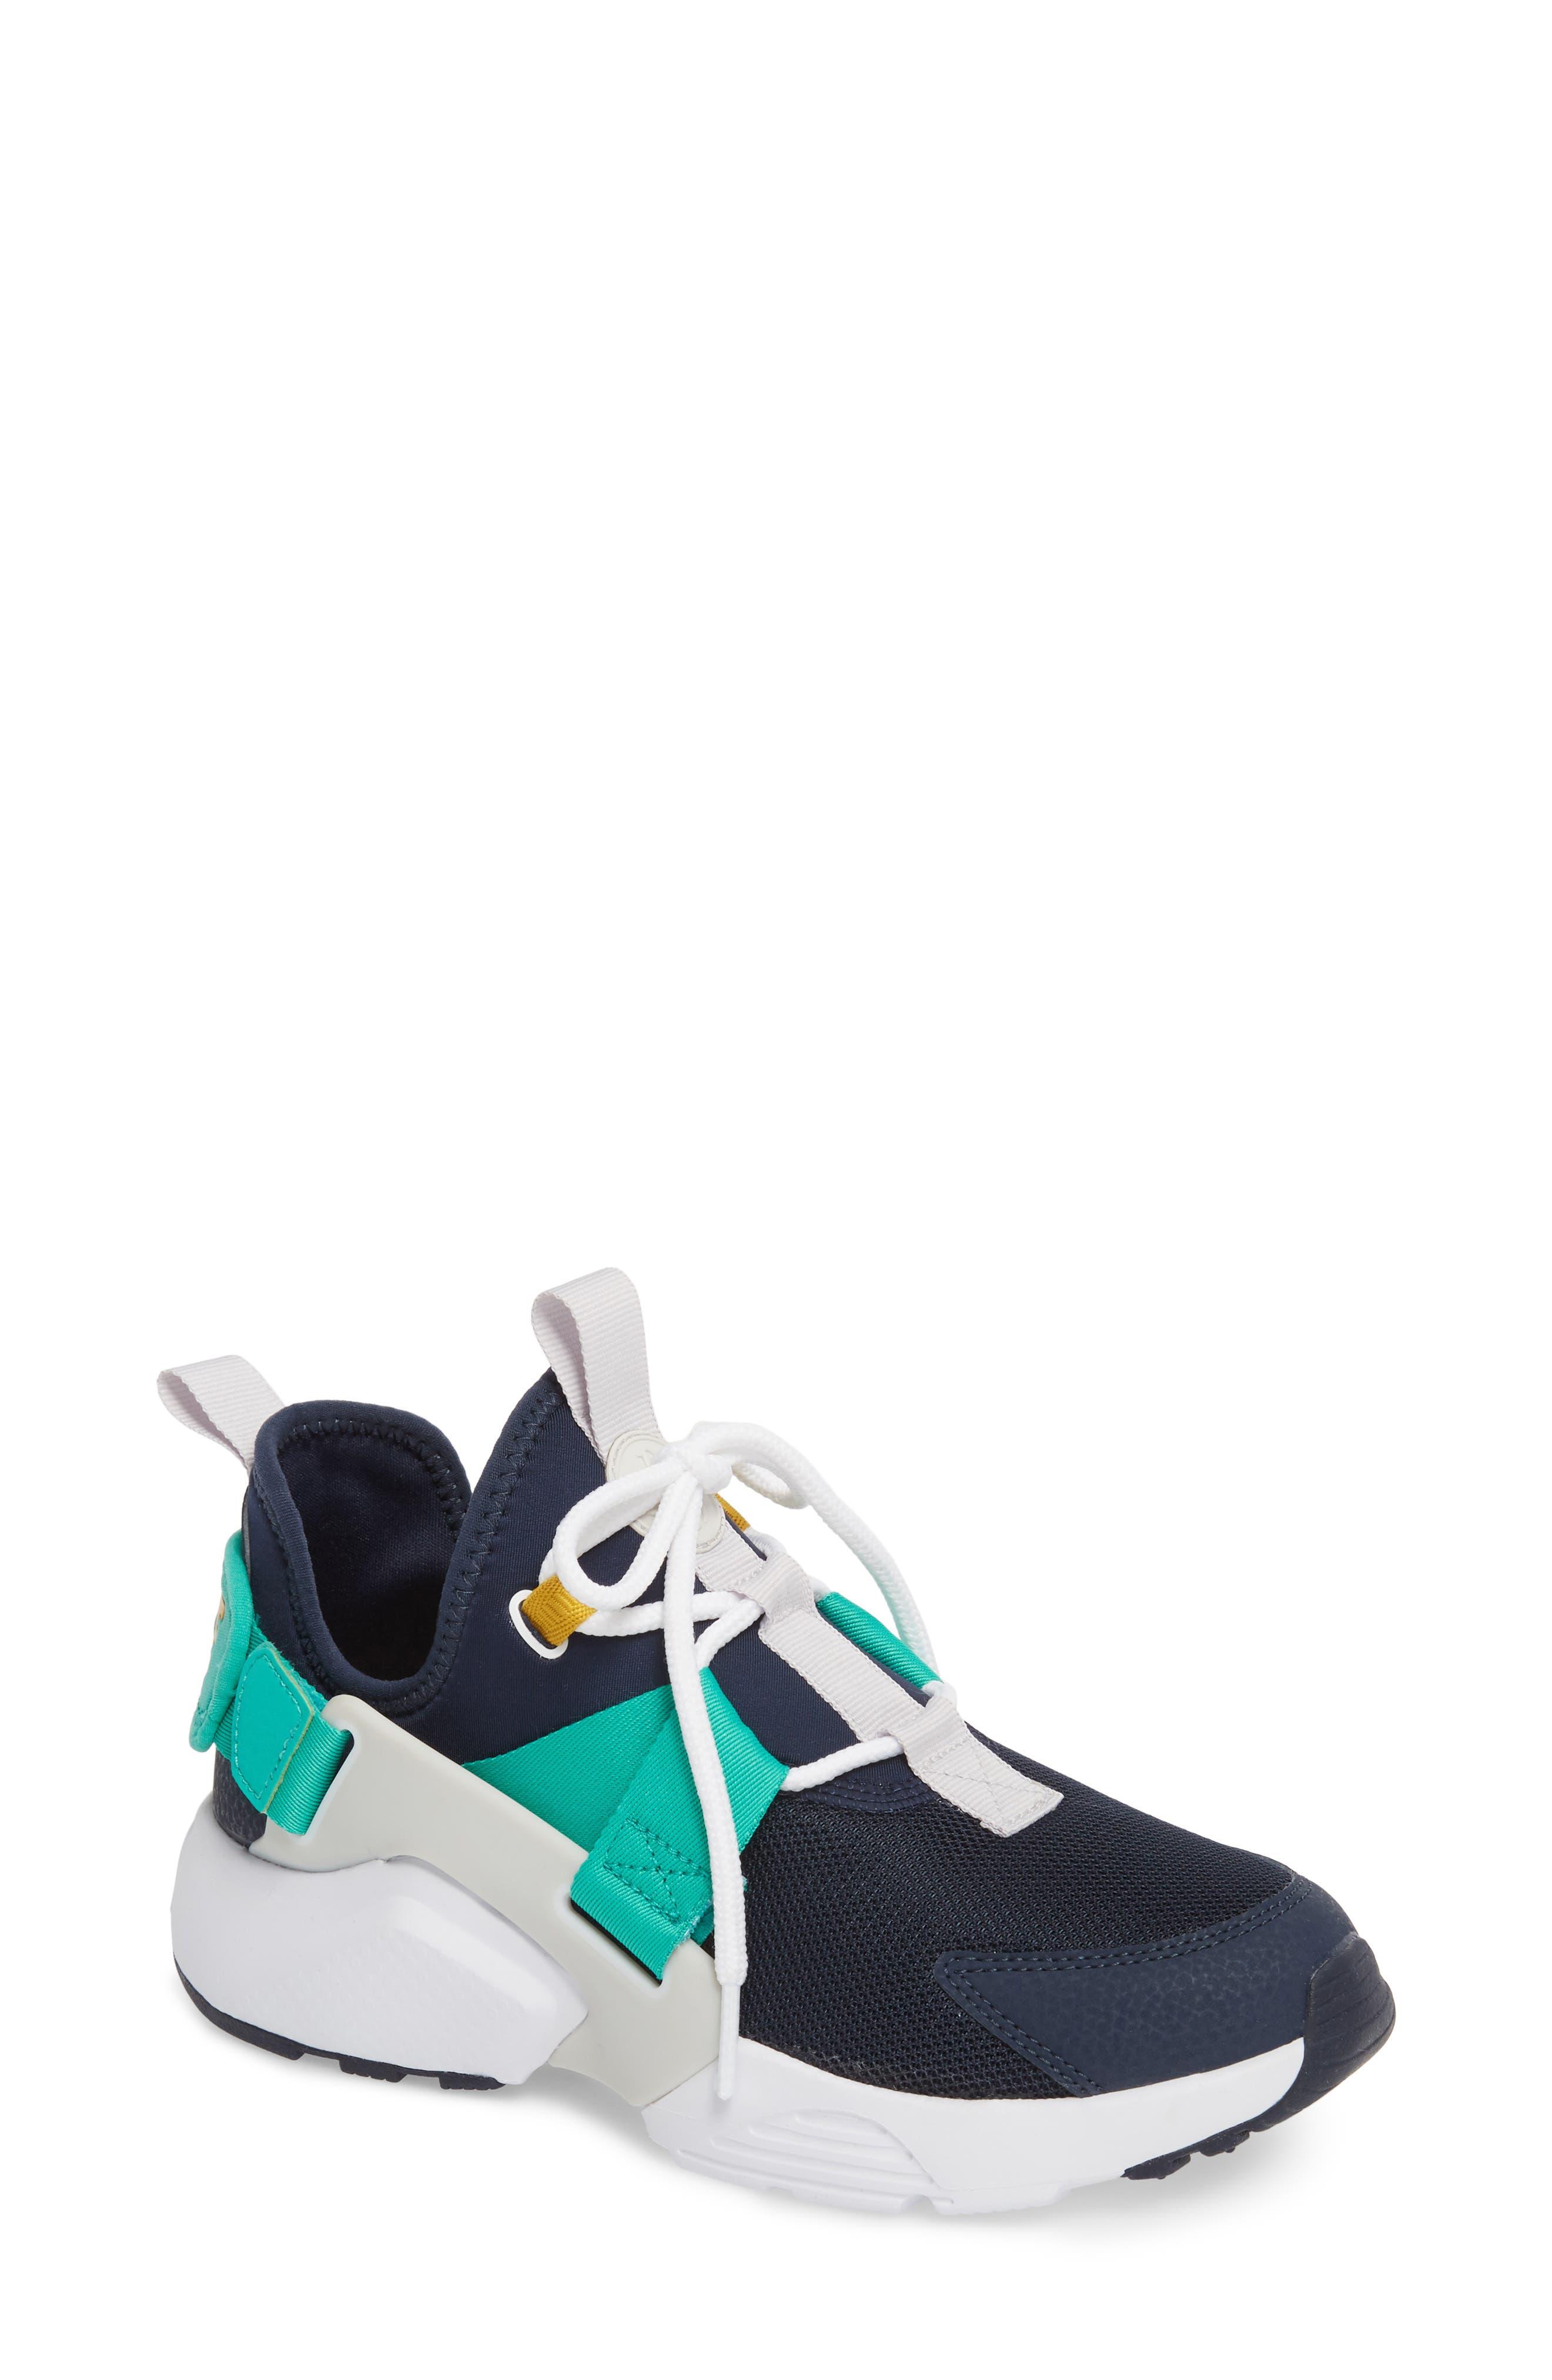 Air Huarache City Low Sneaker,                             Main thumbnail 1, color,                             Obsidian/ White/ Grey/ Green